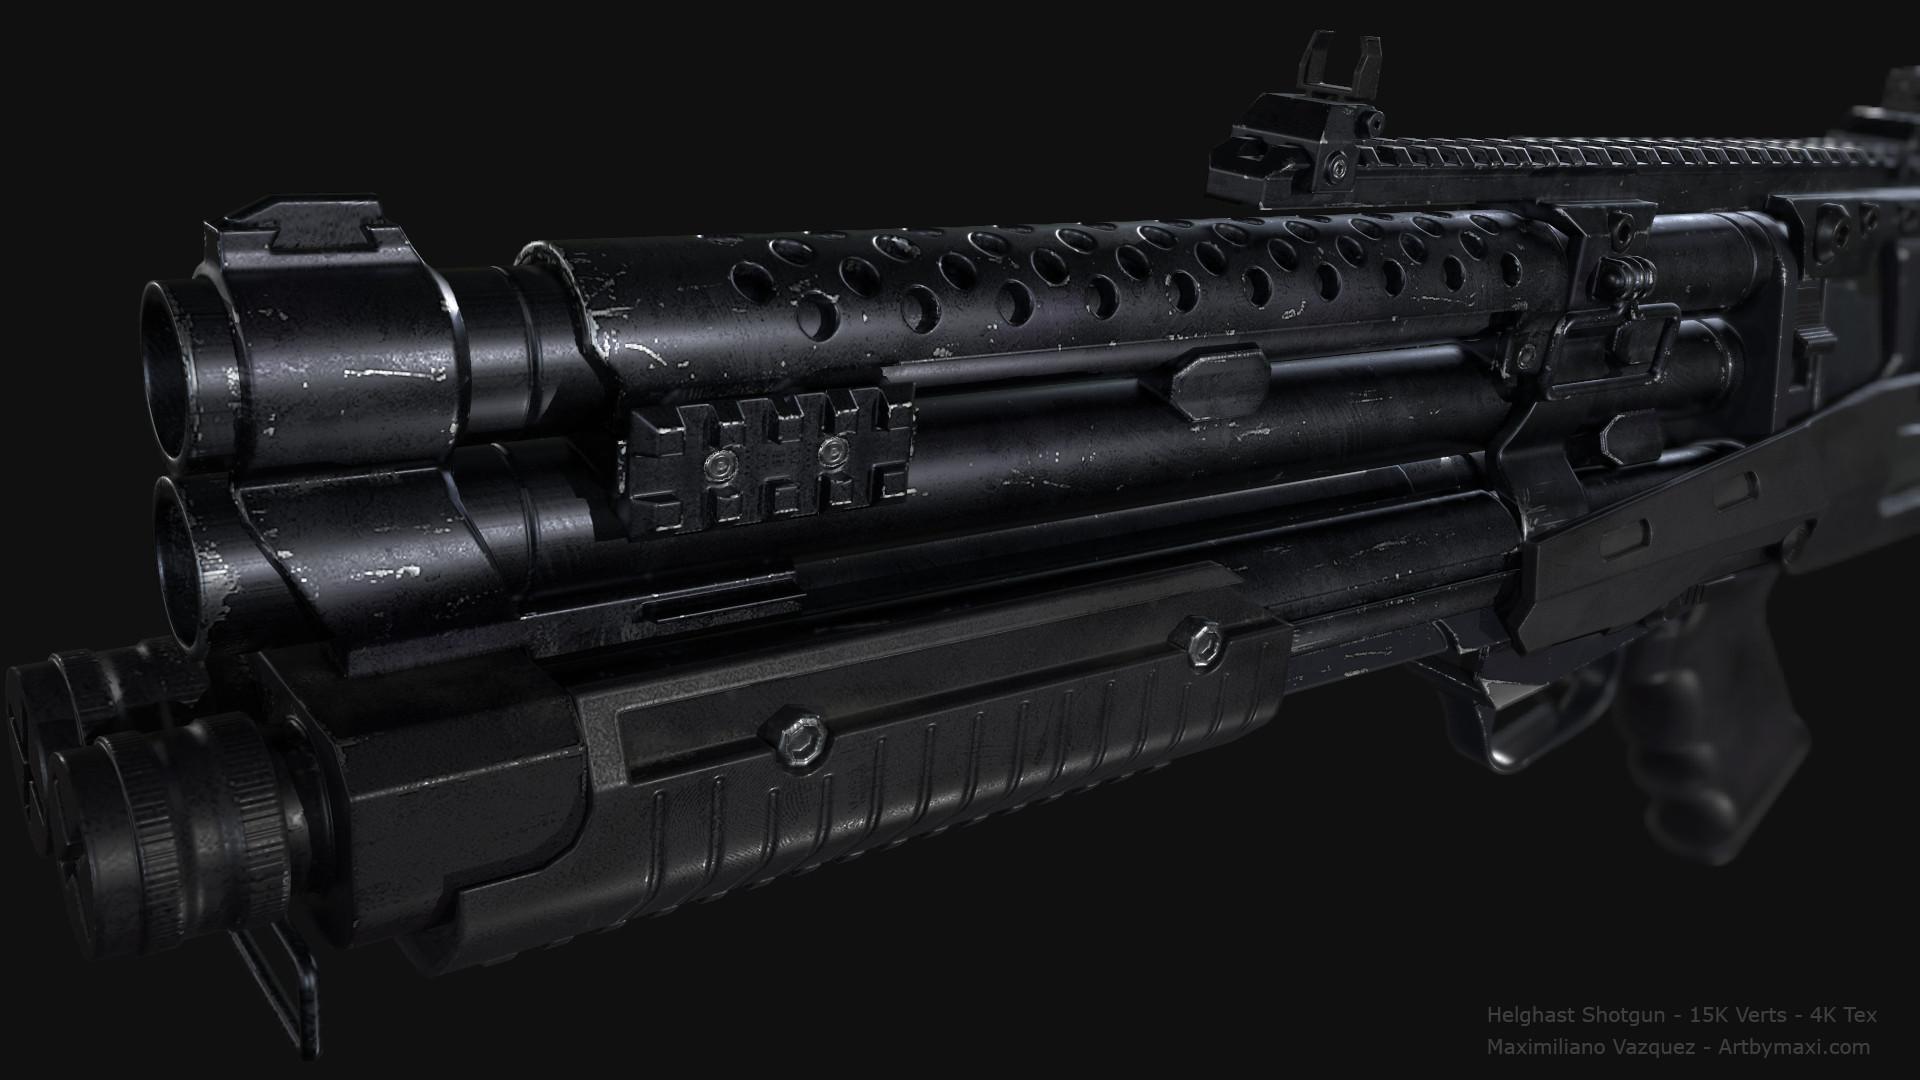 Maximiliano vazquez hellghast shotgun lp12